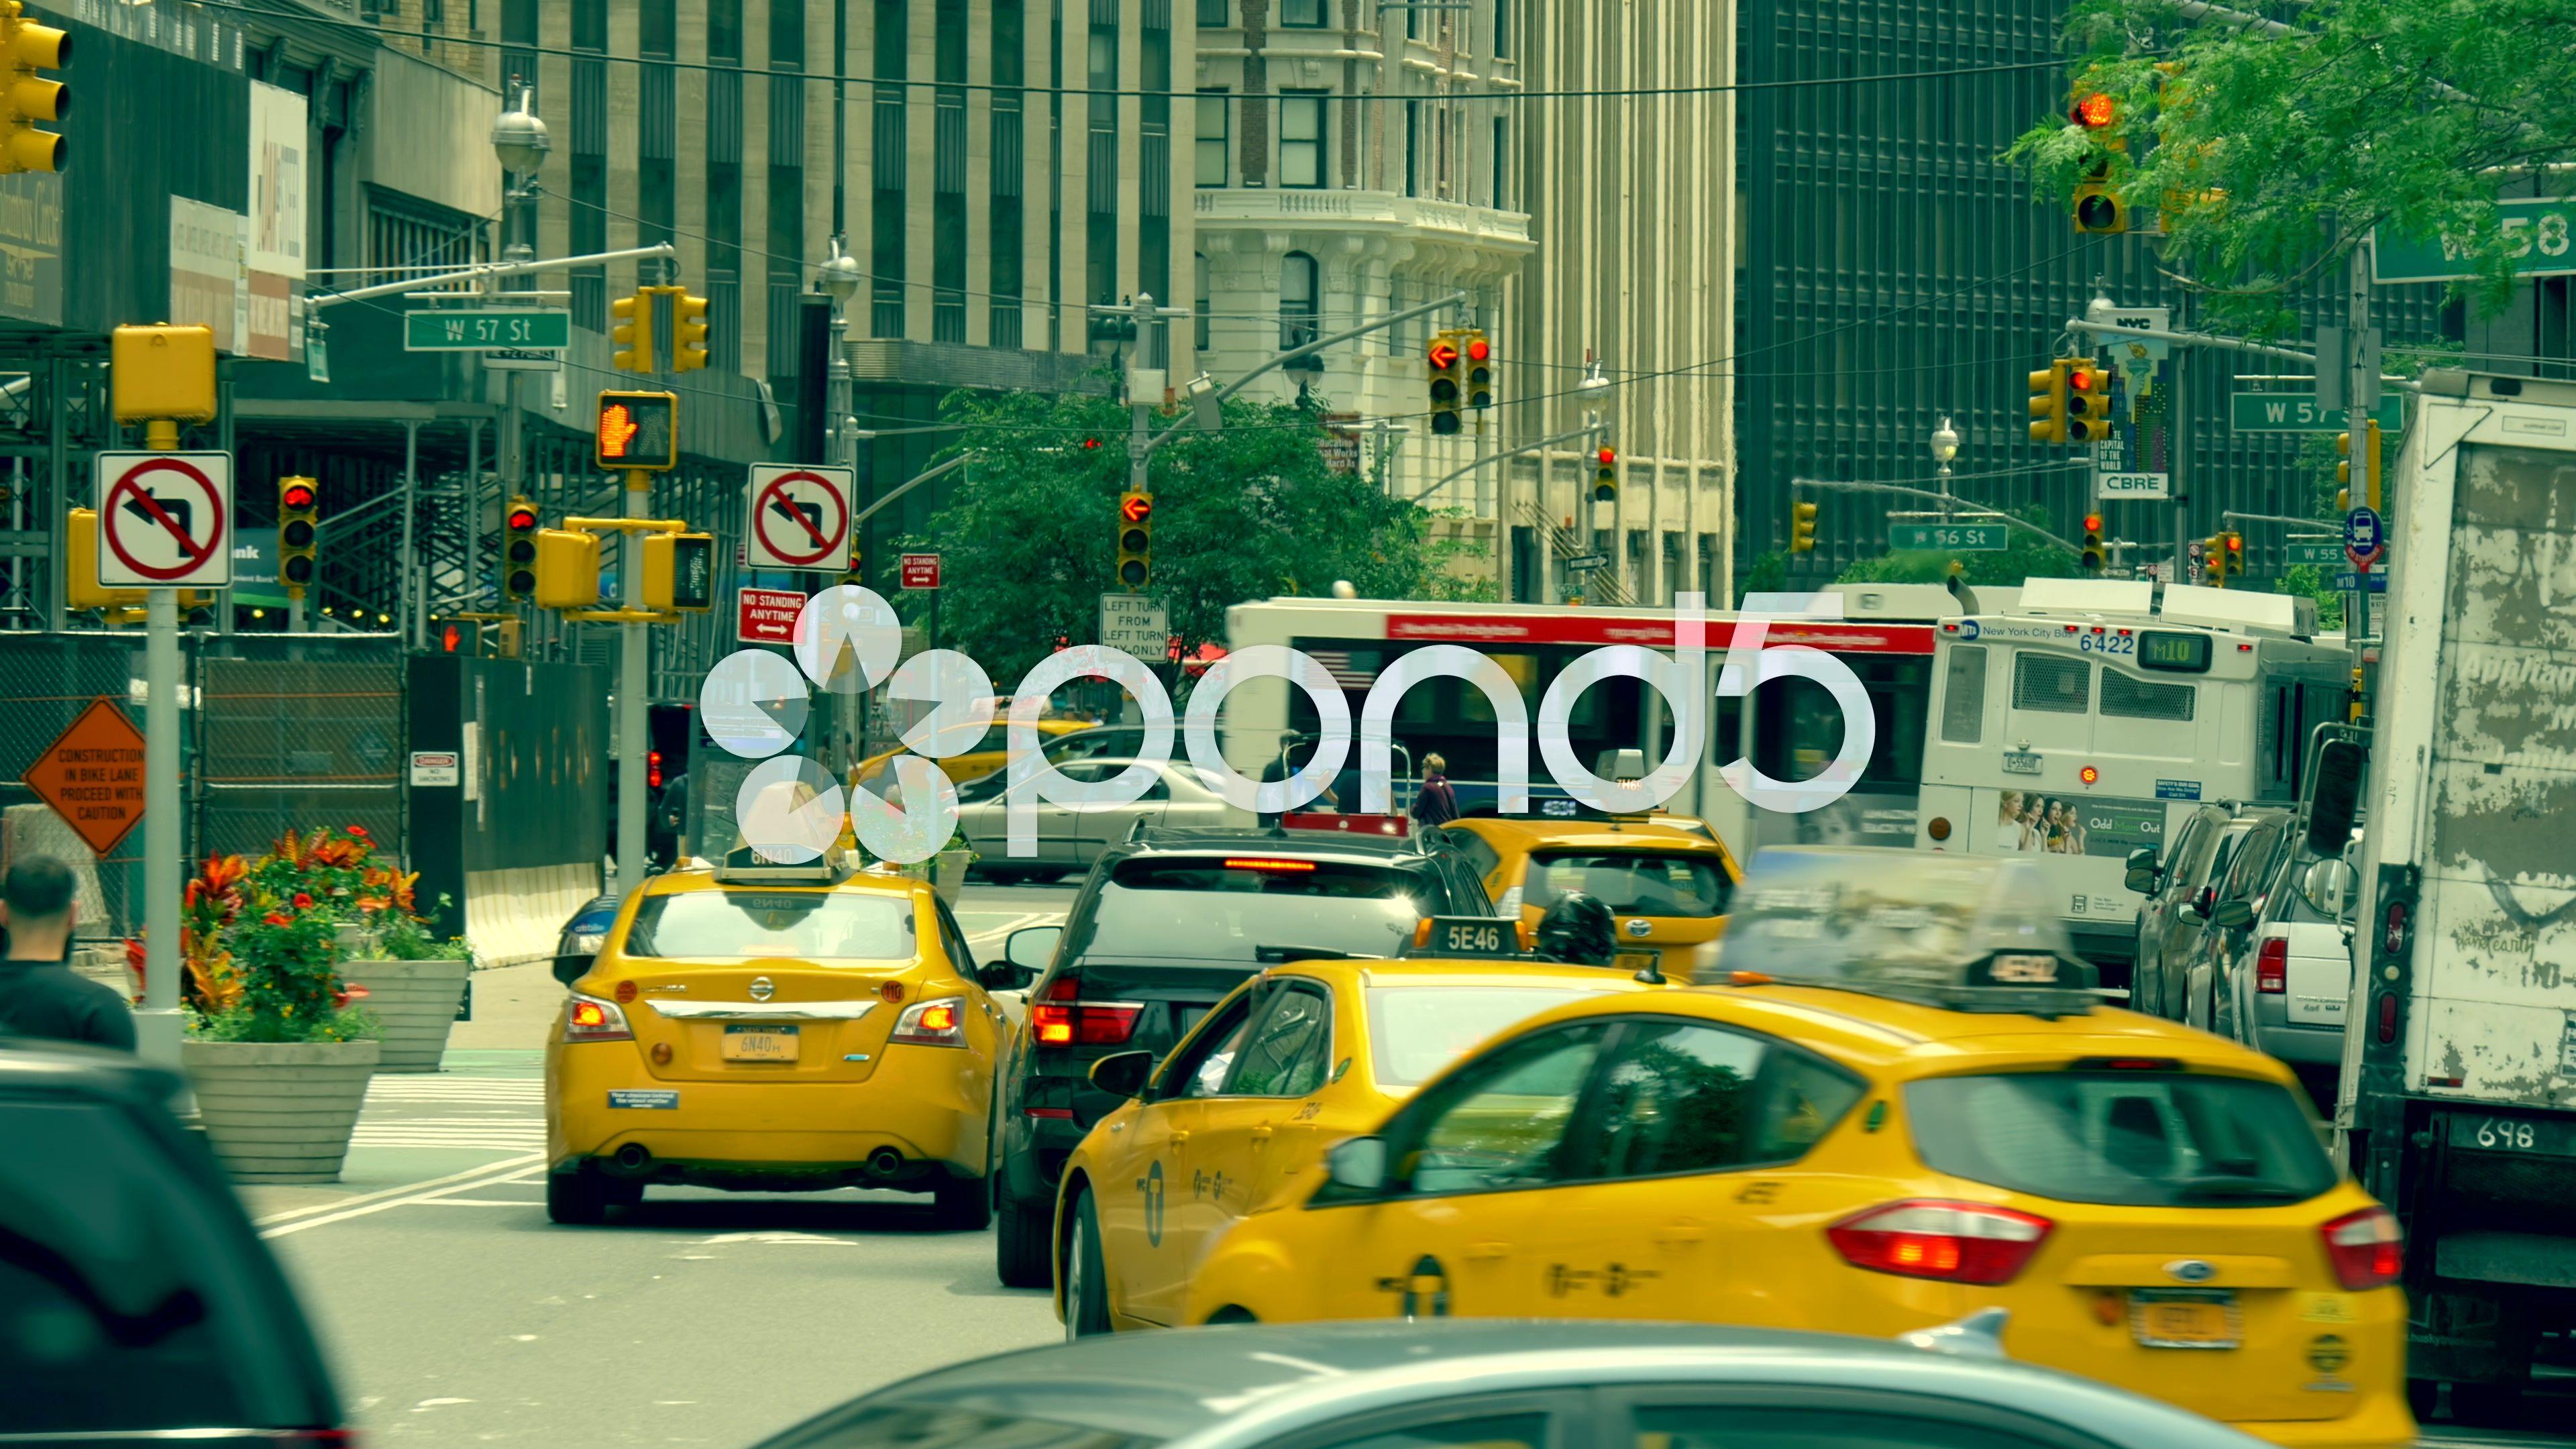 Manhattan Rush Hour Busy Street Traffic Intersection New York City